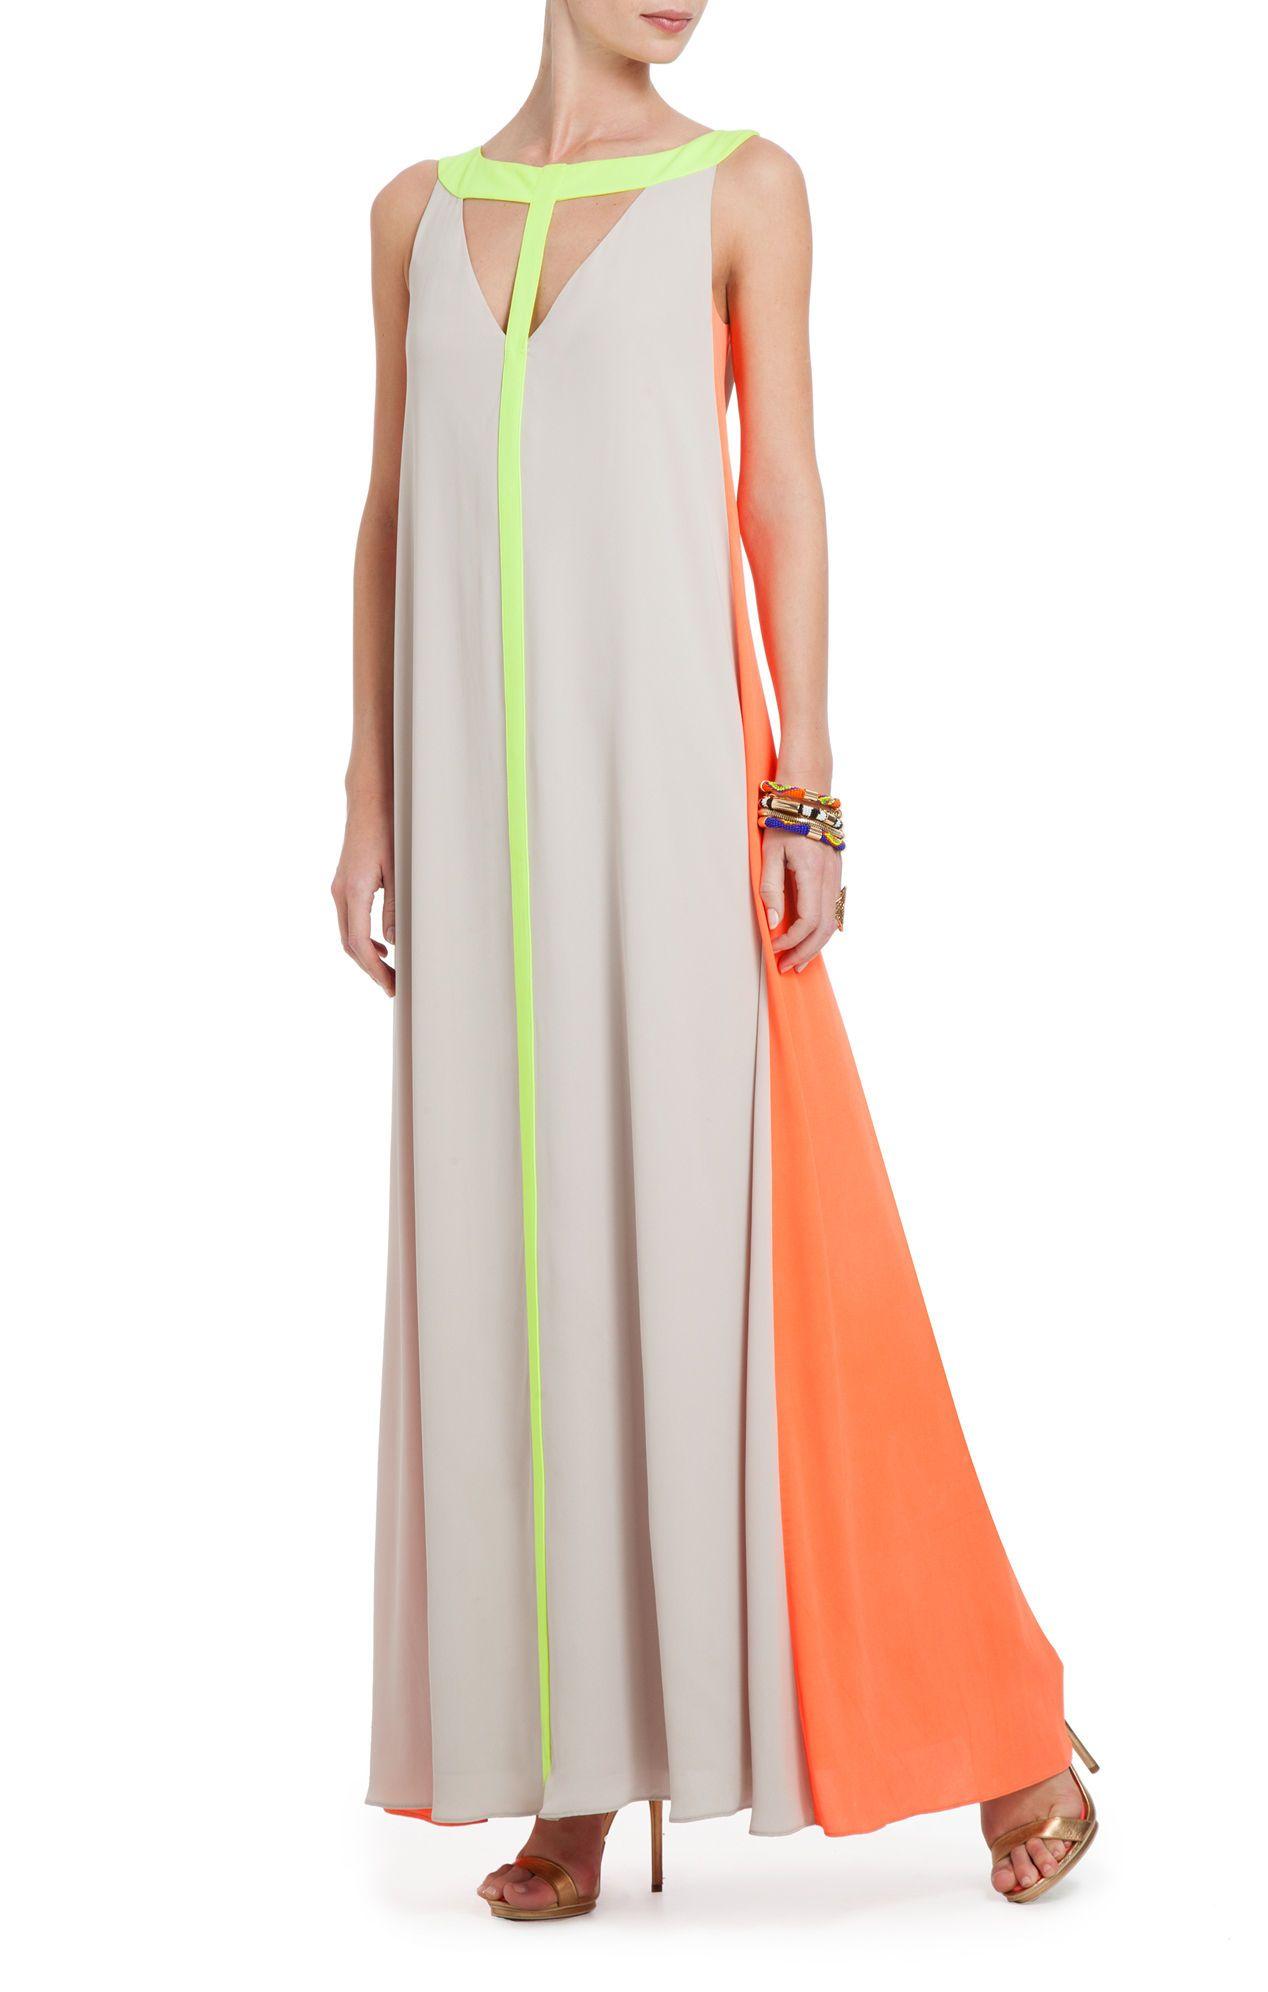 46+ Bcbg cutout maxi dress ideas